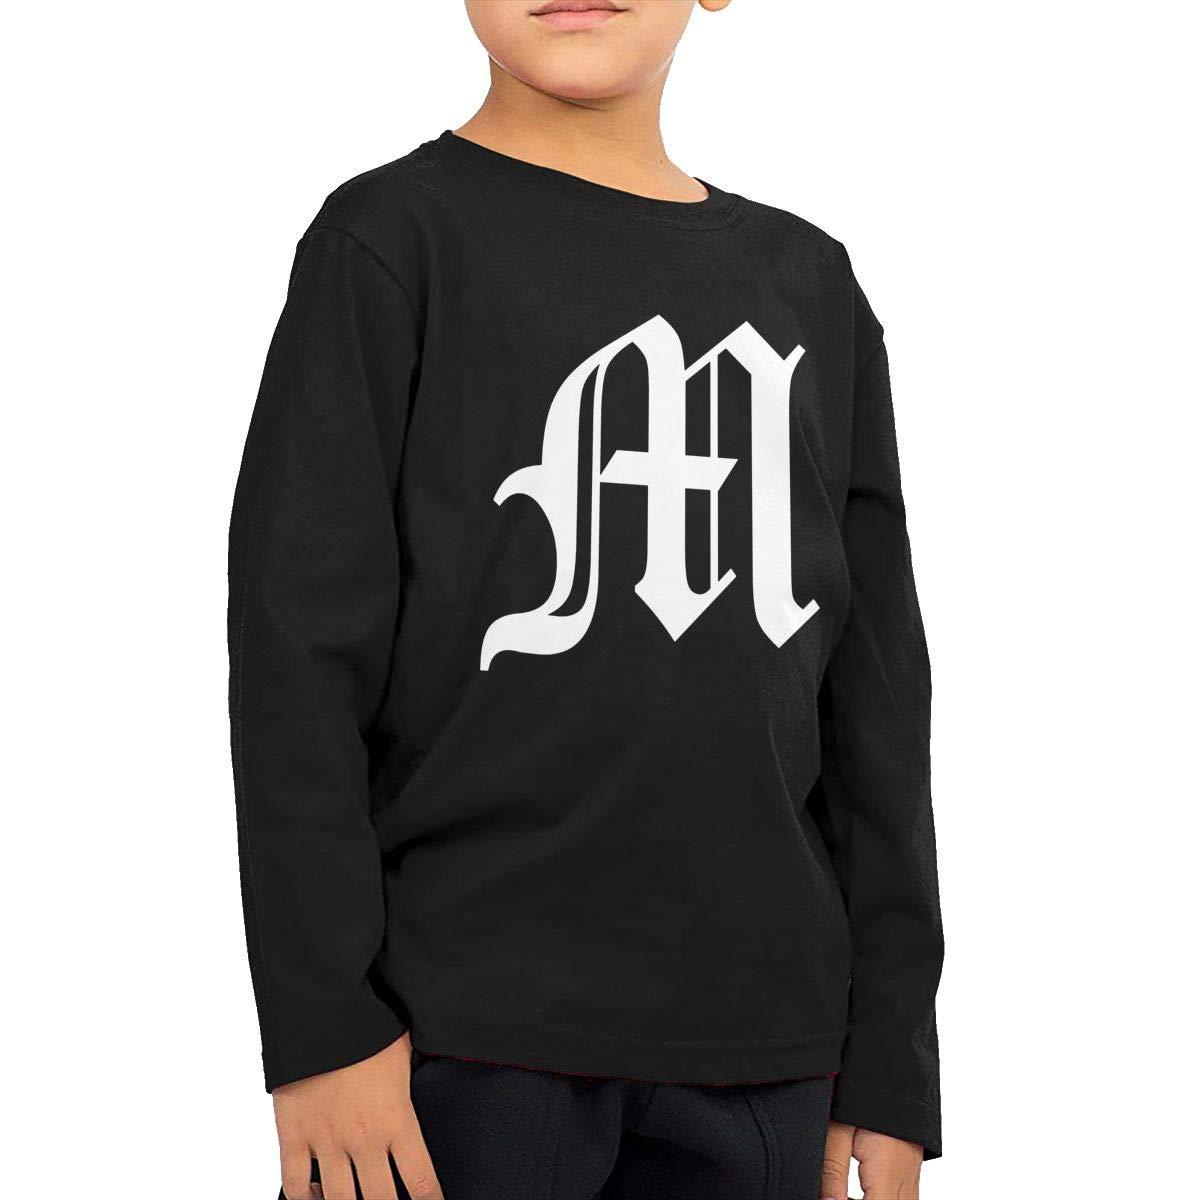 HADYKIDSLOVE Old English Letter M Initial Kids T-Shirt Long Sleeve Boys Girls T-Shirt